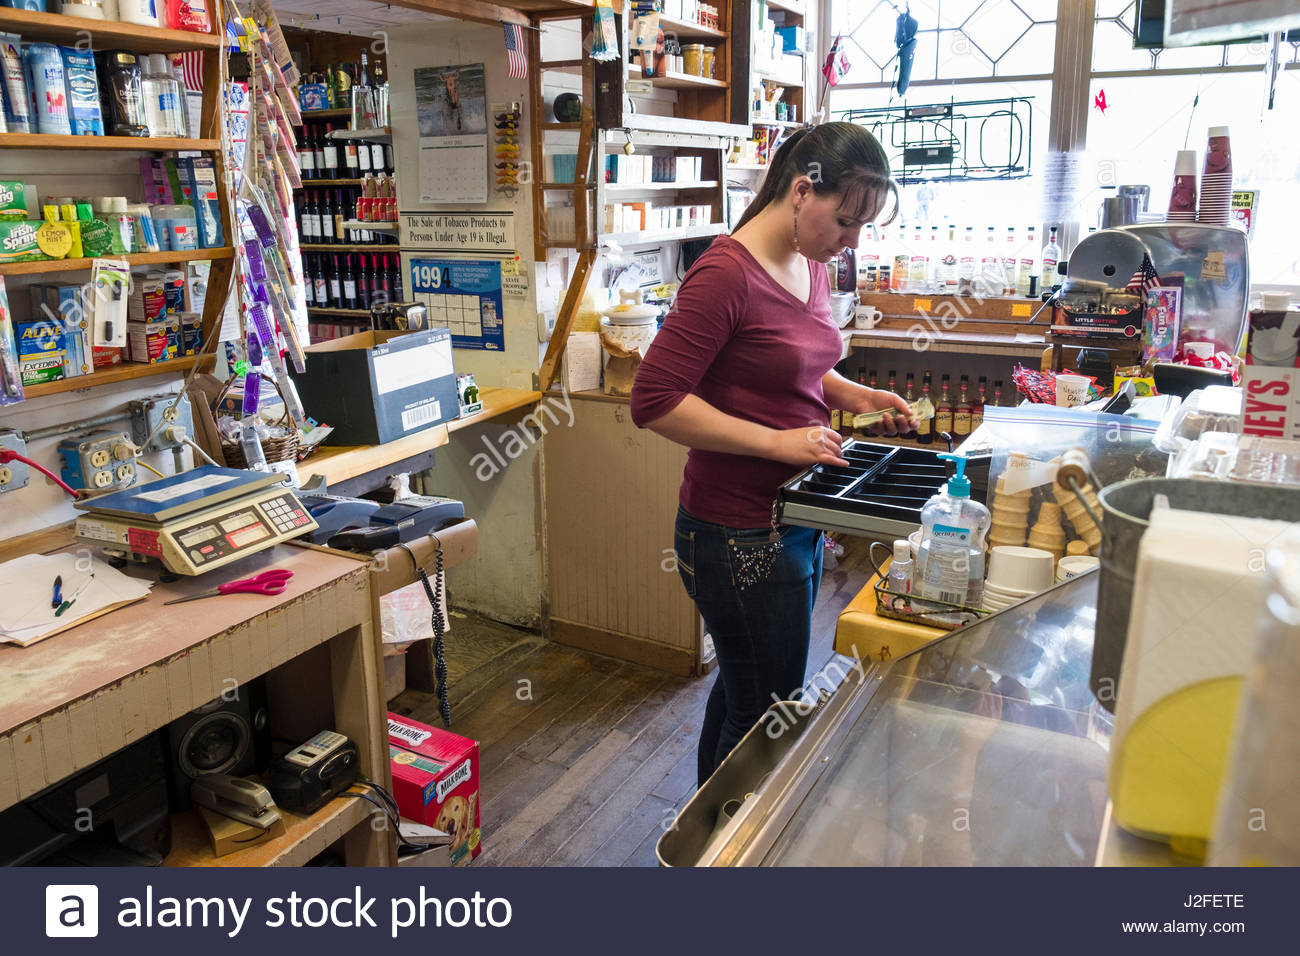 Alaska matanuska susitna county talkeetna - Woman Working Behind Counter Inside Nagley S Store Talkeetna Matanuska Susitna Borough Alaska Usa